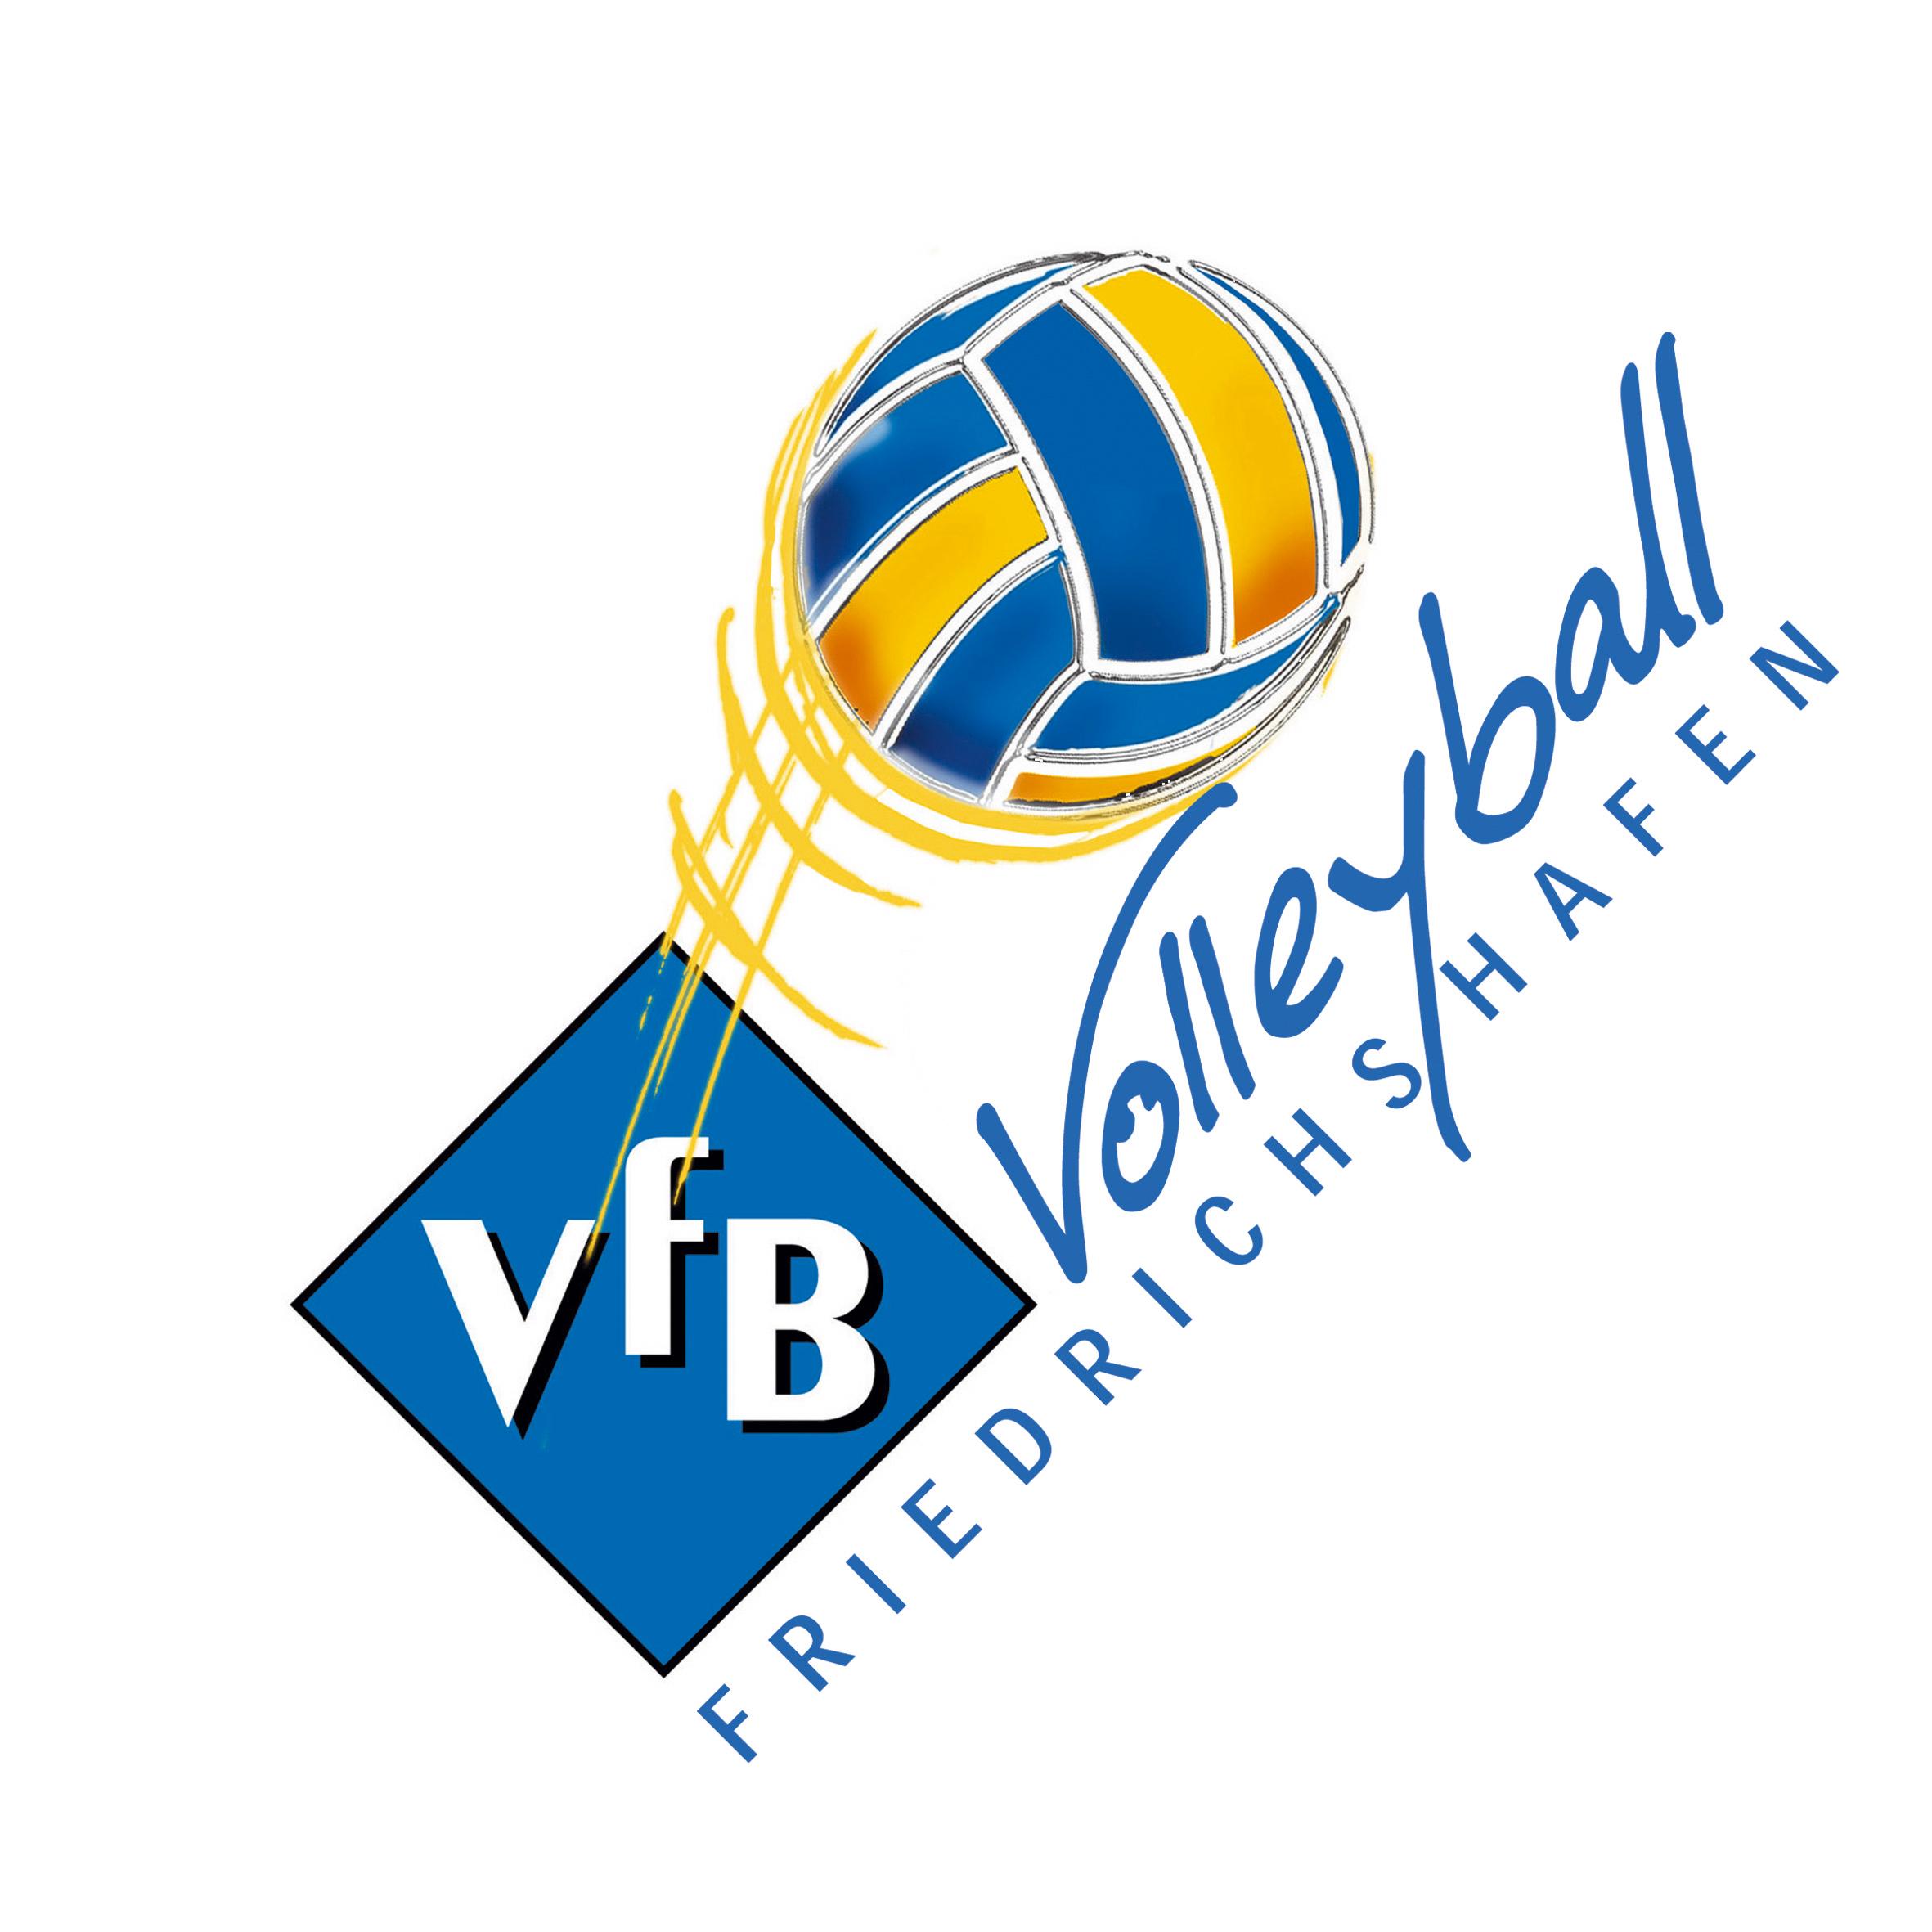 VfB Volleyball logo.jpg